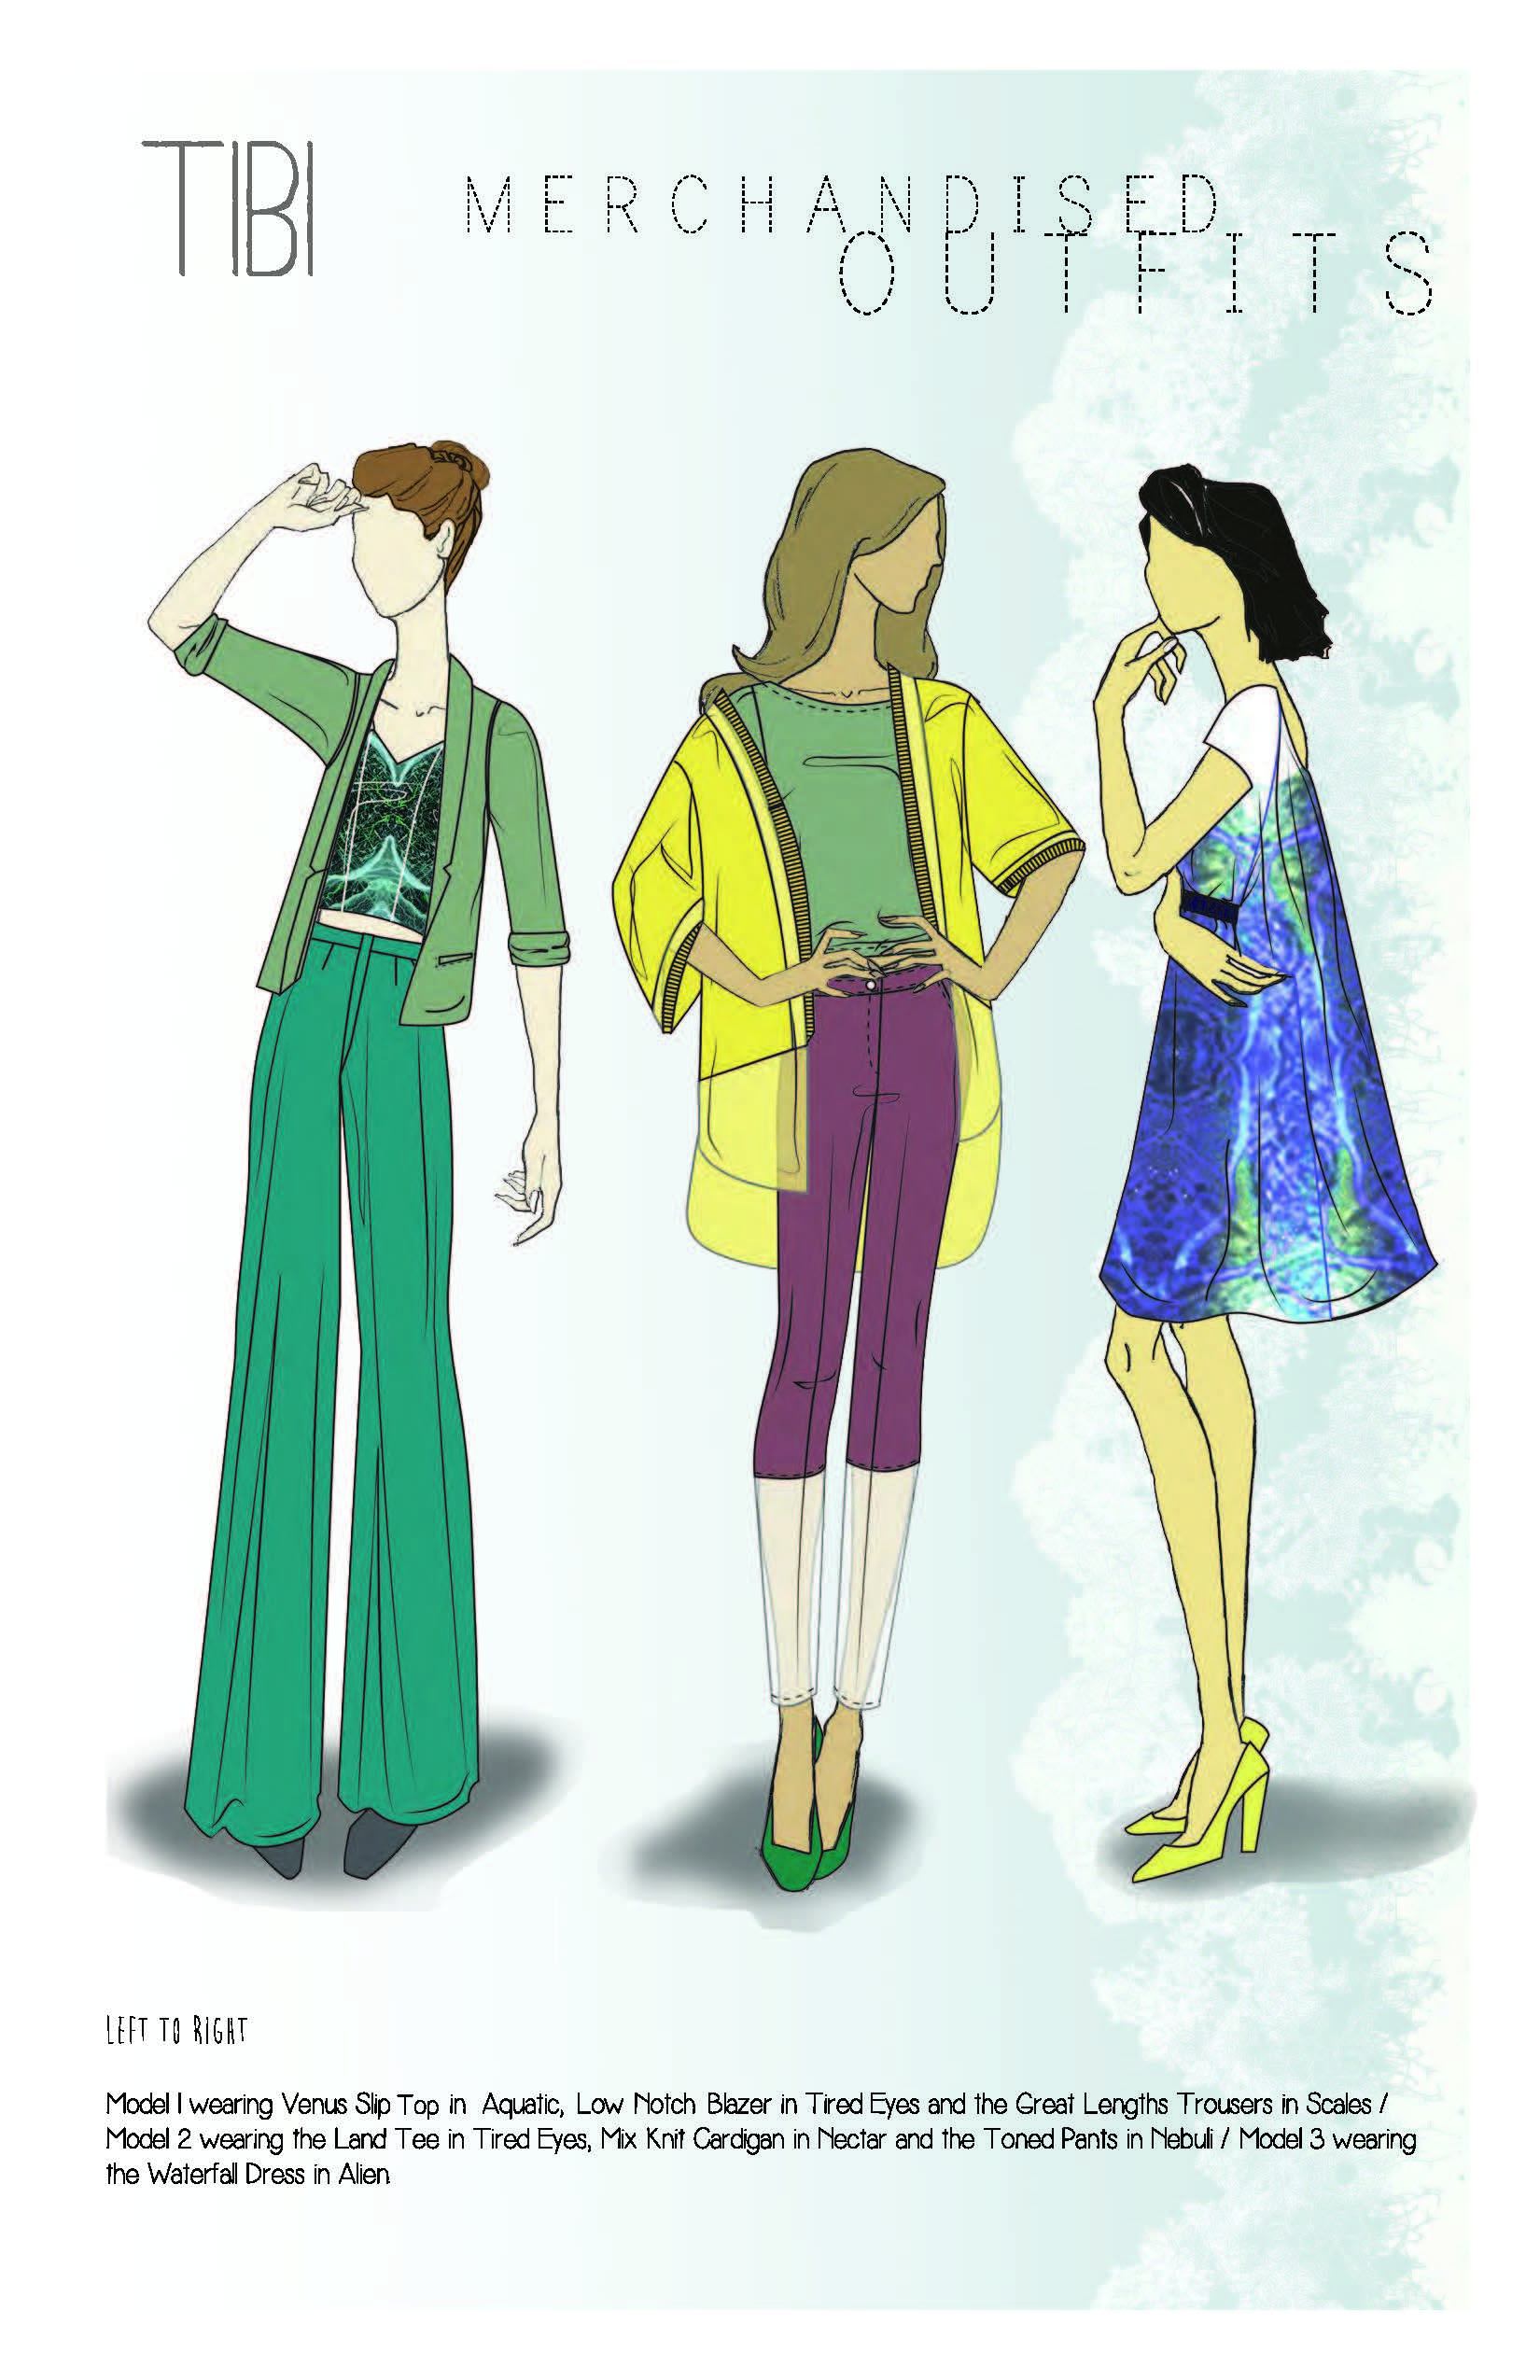 - Fashion Design / Product Development